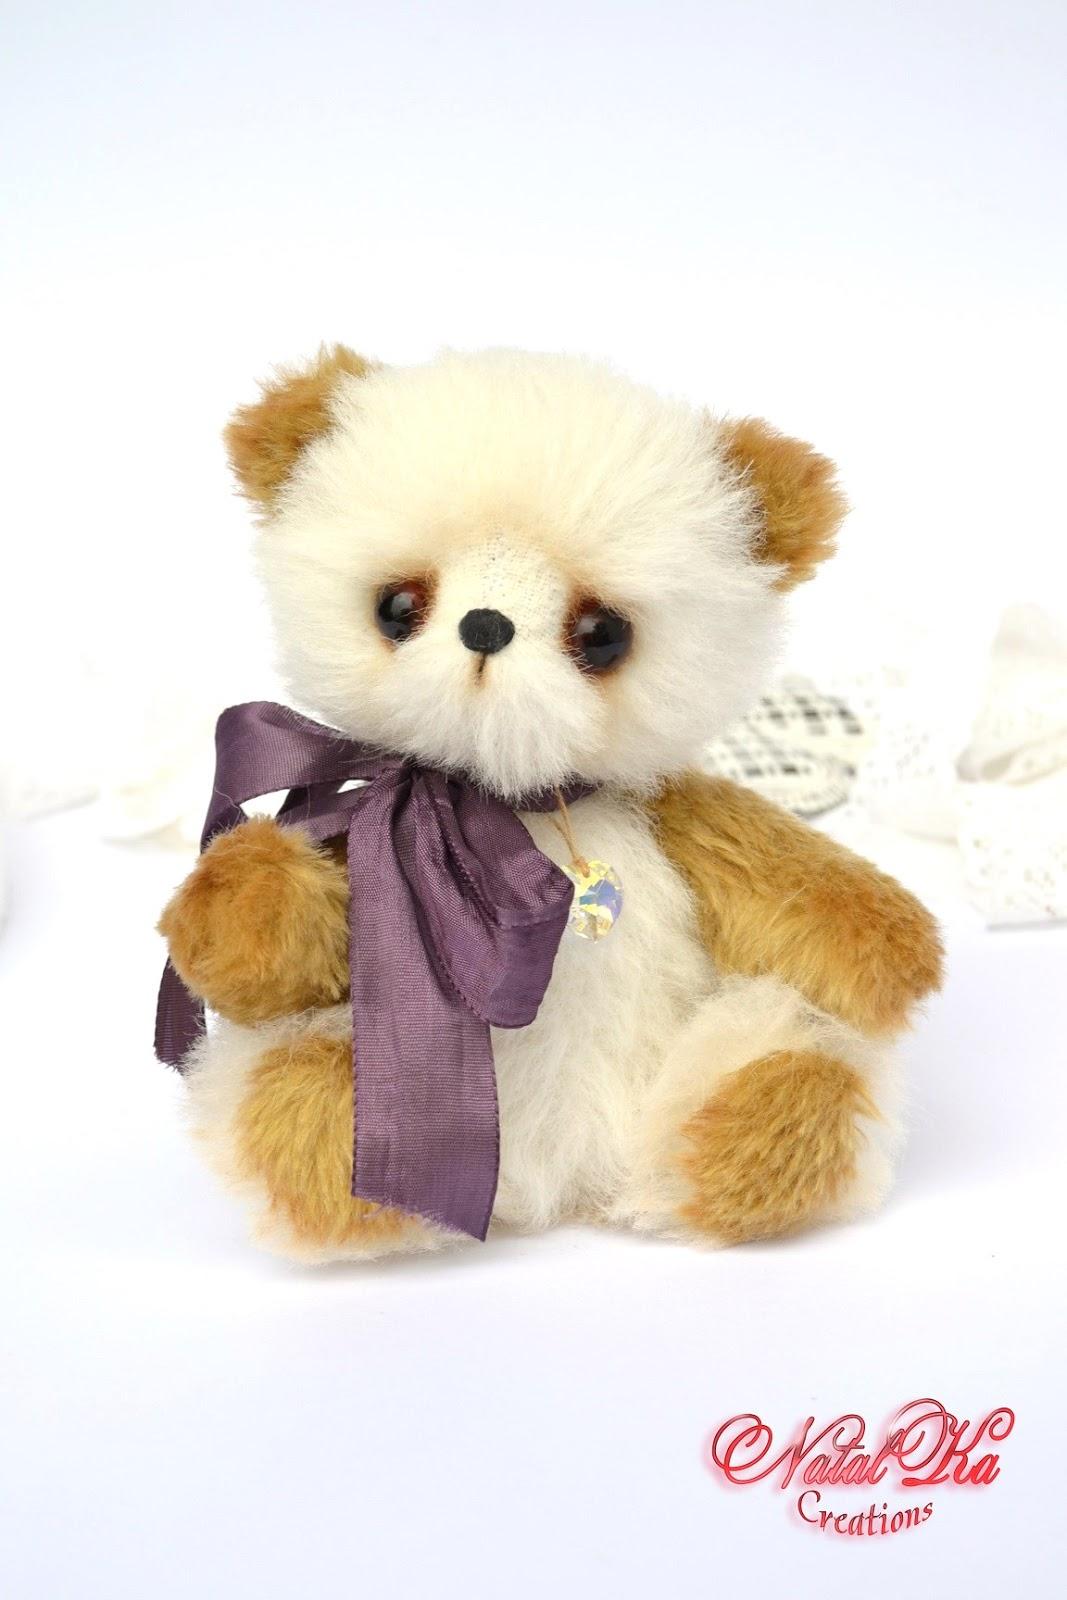 Авторский медведь тедди, мишка тедди из мохера от NatalKa Creations. Artist teddy bear, teddies, teddy bear, mohair, ooak, handmade by NatalKa Creations